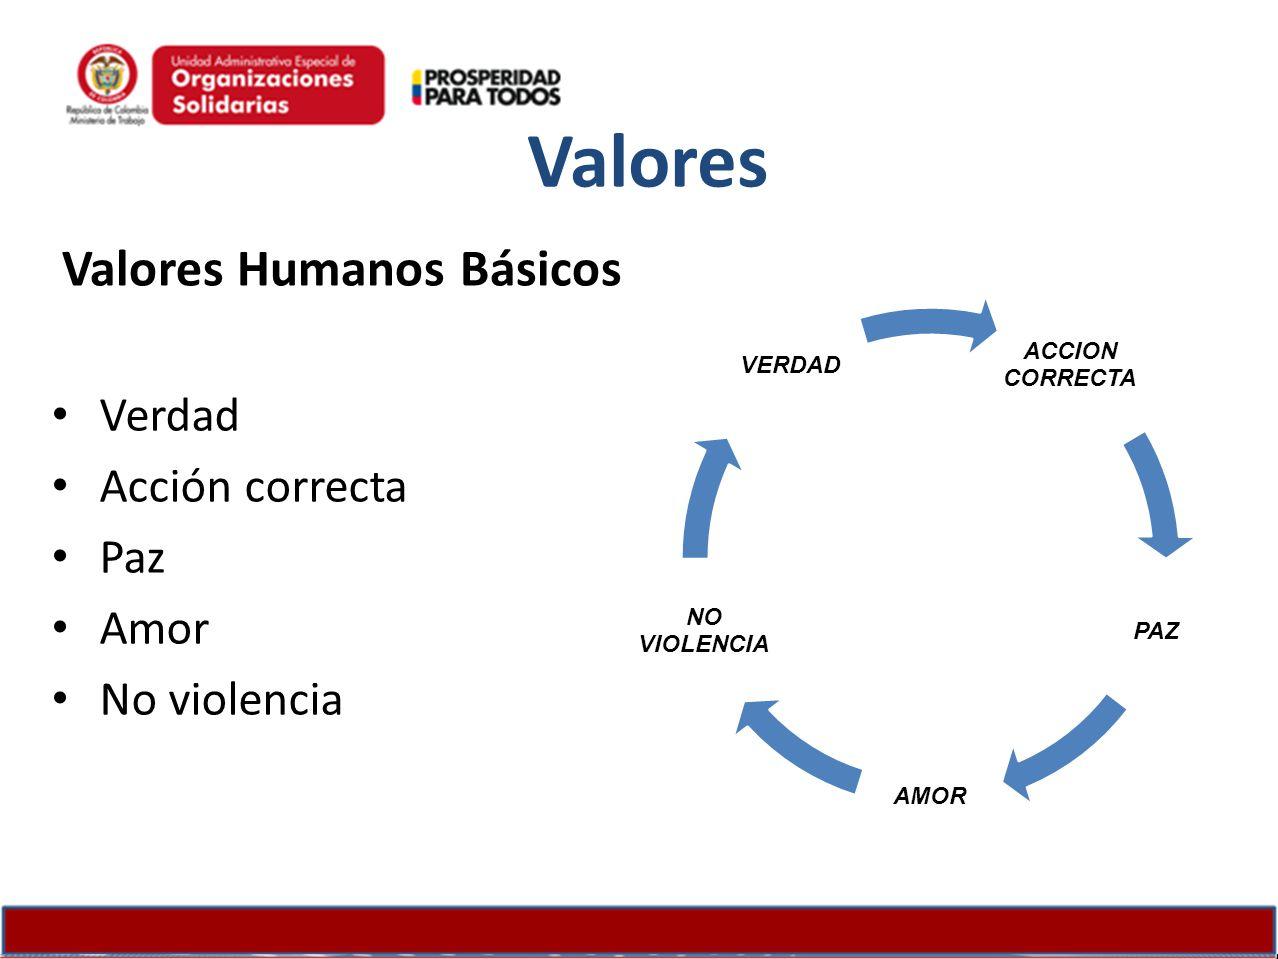 Valores Humanos Básicos Verdad Acción correcta Paz Amor No violencia ACCION CORRECTA PAZ AMOR NO VIOLENCIA VERDAD Valores